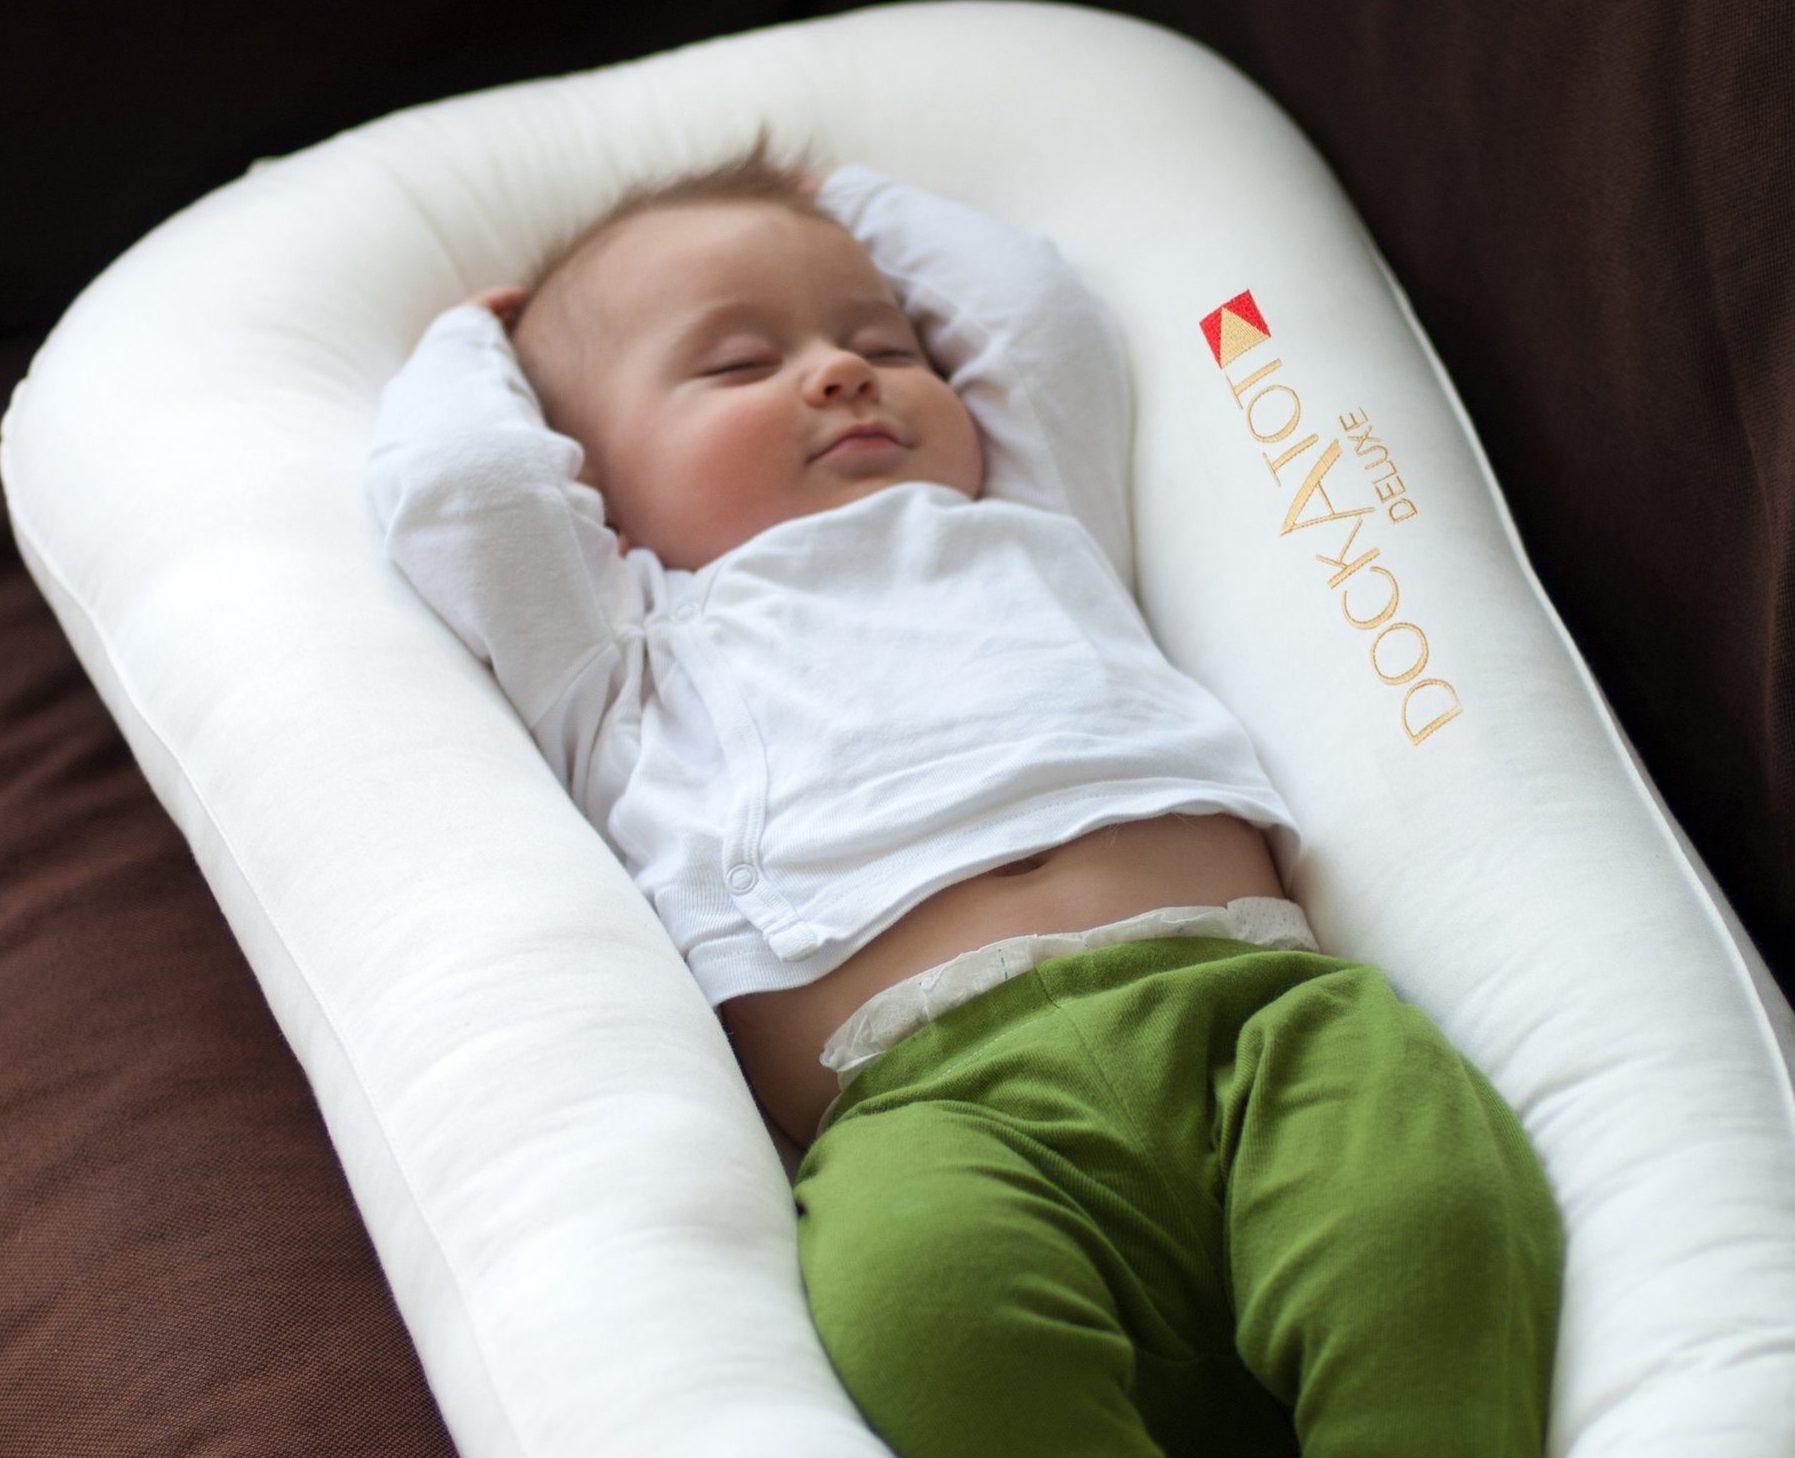 A baby sleeping on a white DockATot Nest.